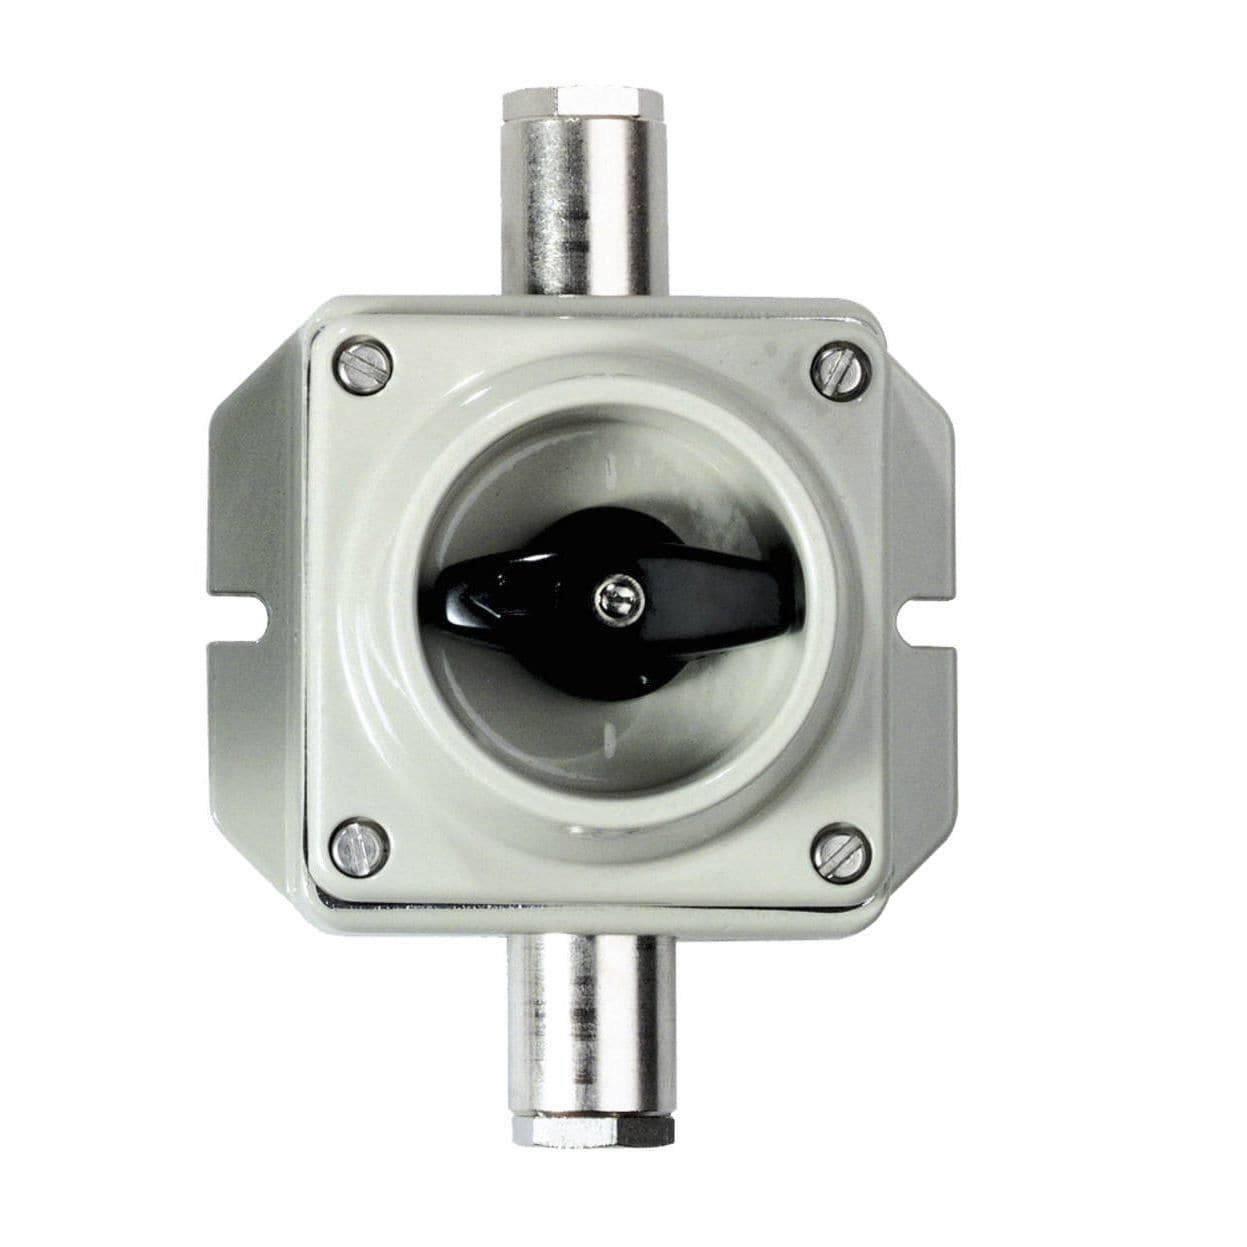 Drehbarer Umschalter / zweipolig / On Off / Aluminium - 75212 series ...